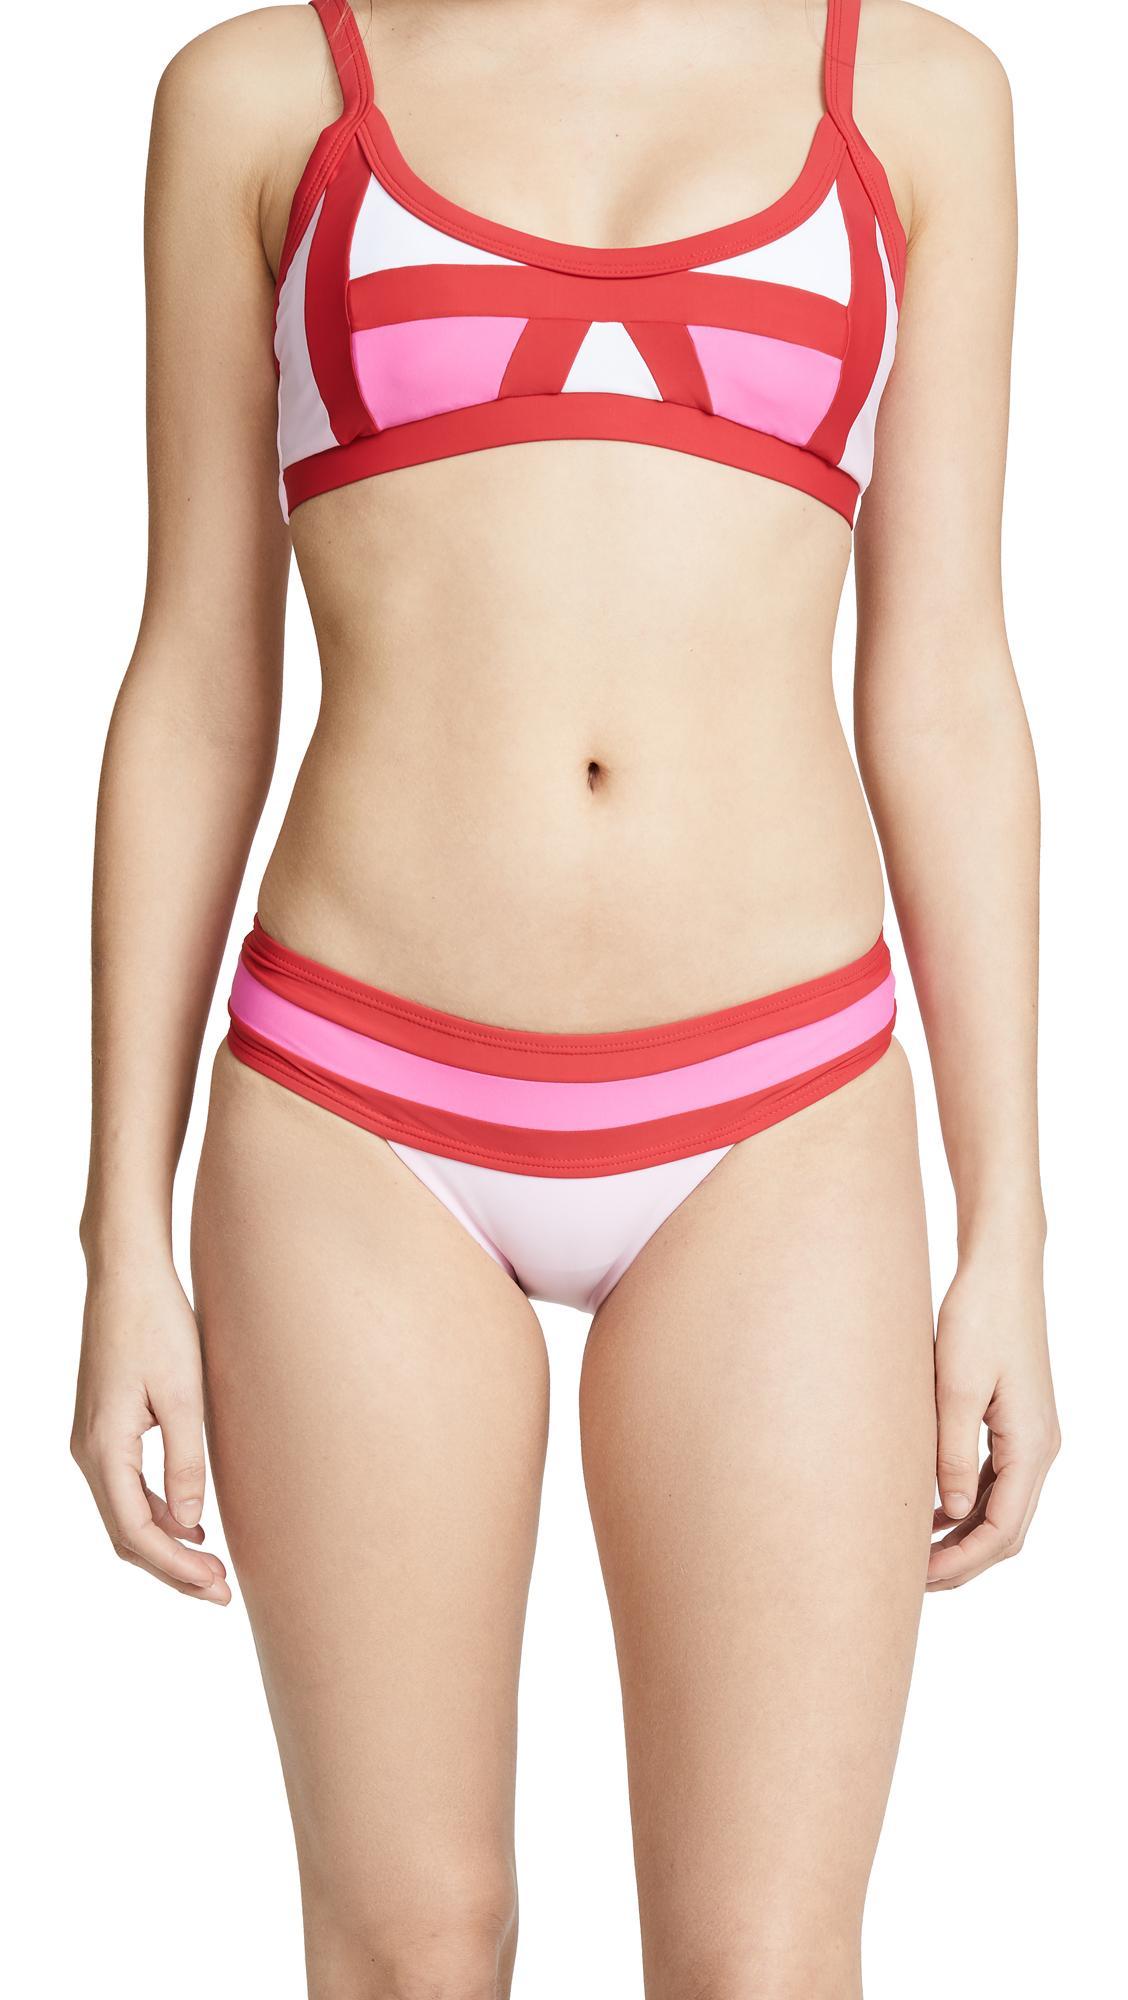 Color block bikini porn hot